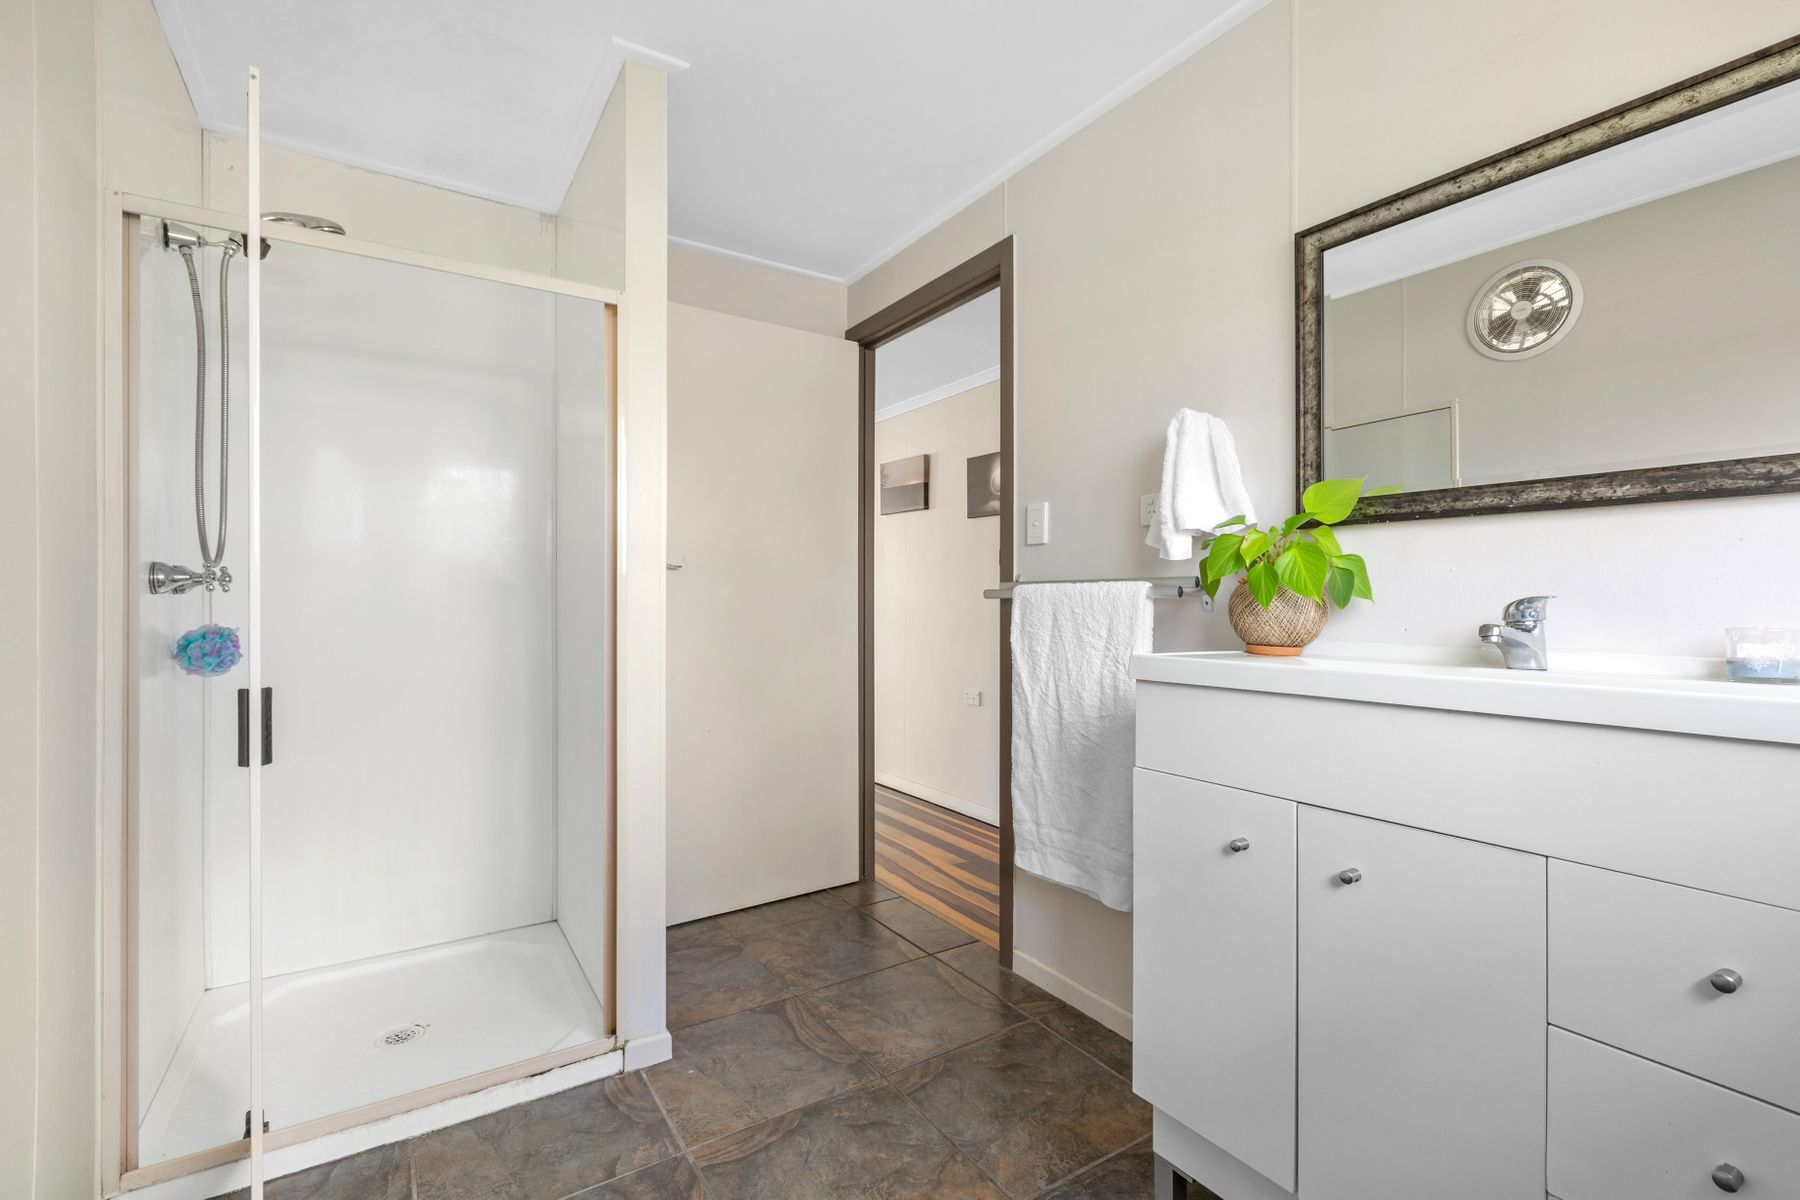 8 Belvedere Avenue, Belvedere, QLD 4860